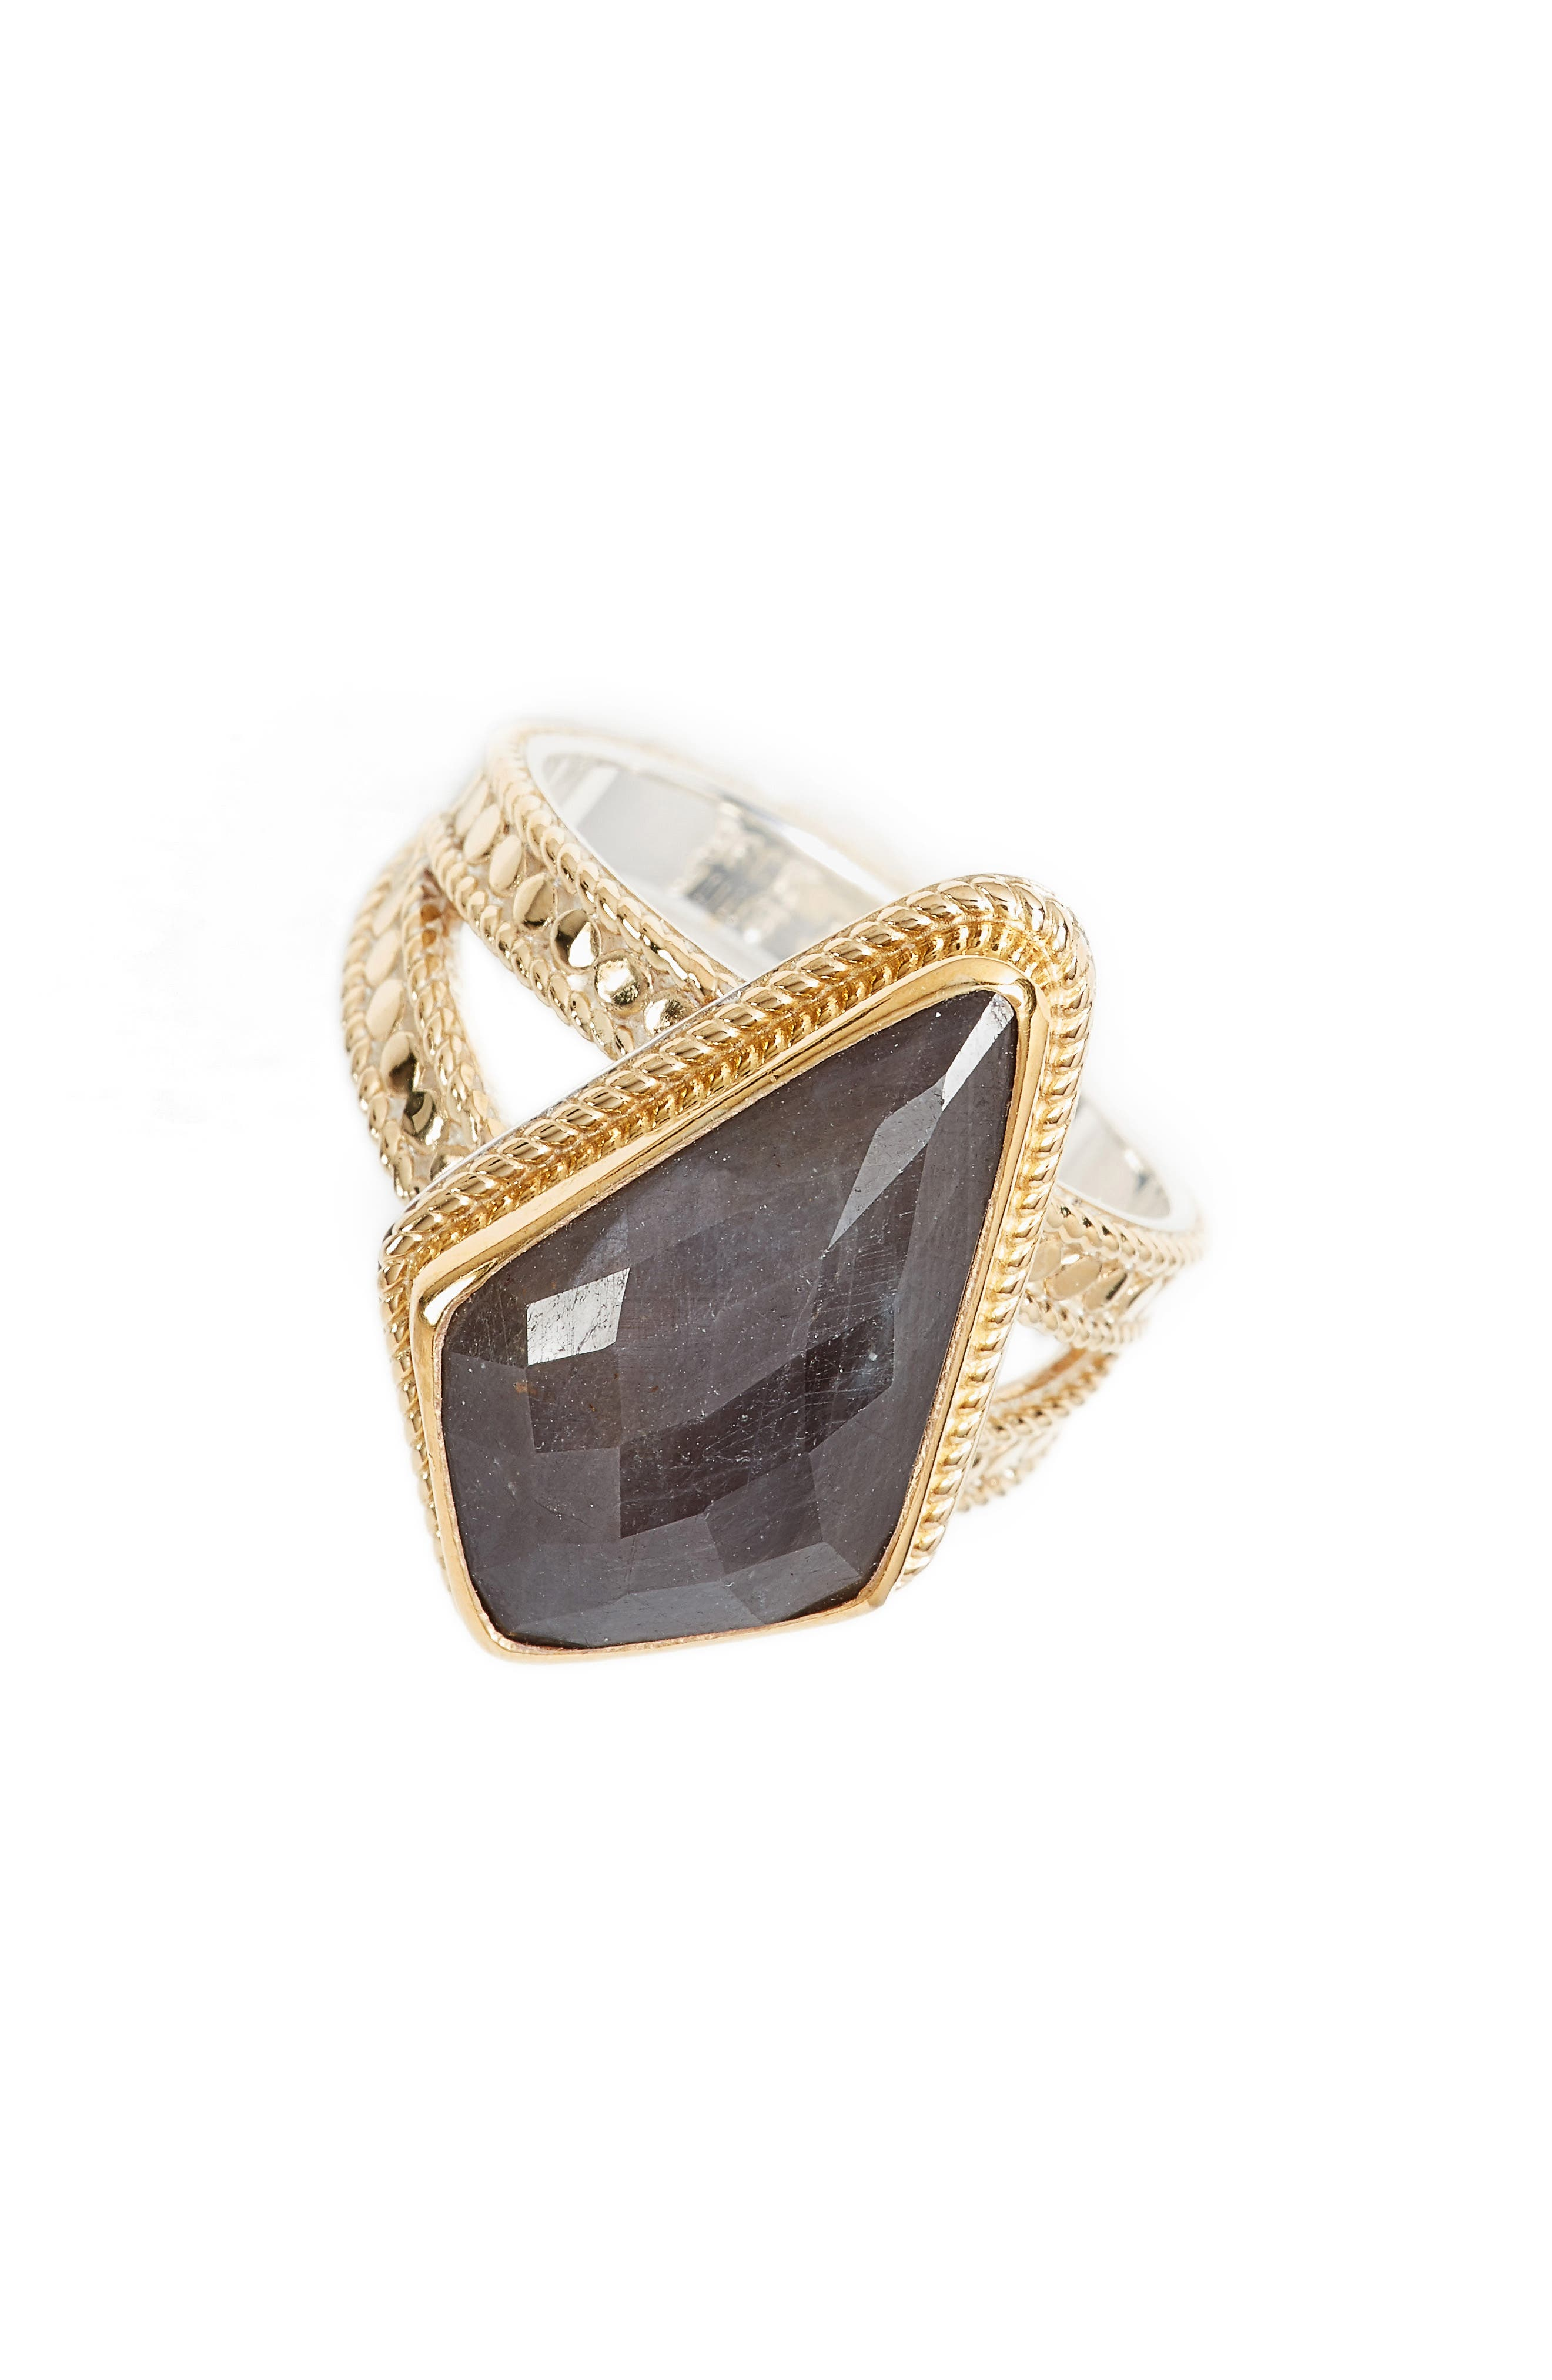 Grey Sapphire Kite Ring,                             Main thumbnail 1, color,                             Gold/ Silver/ Grey Sapphire